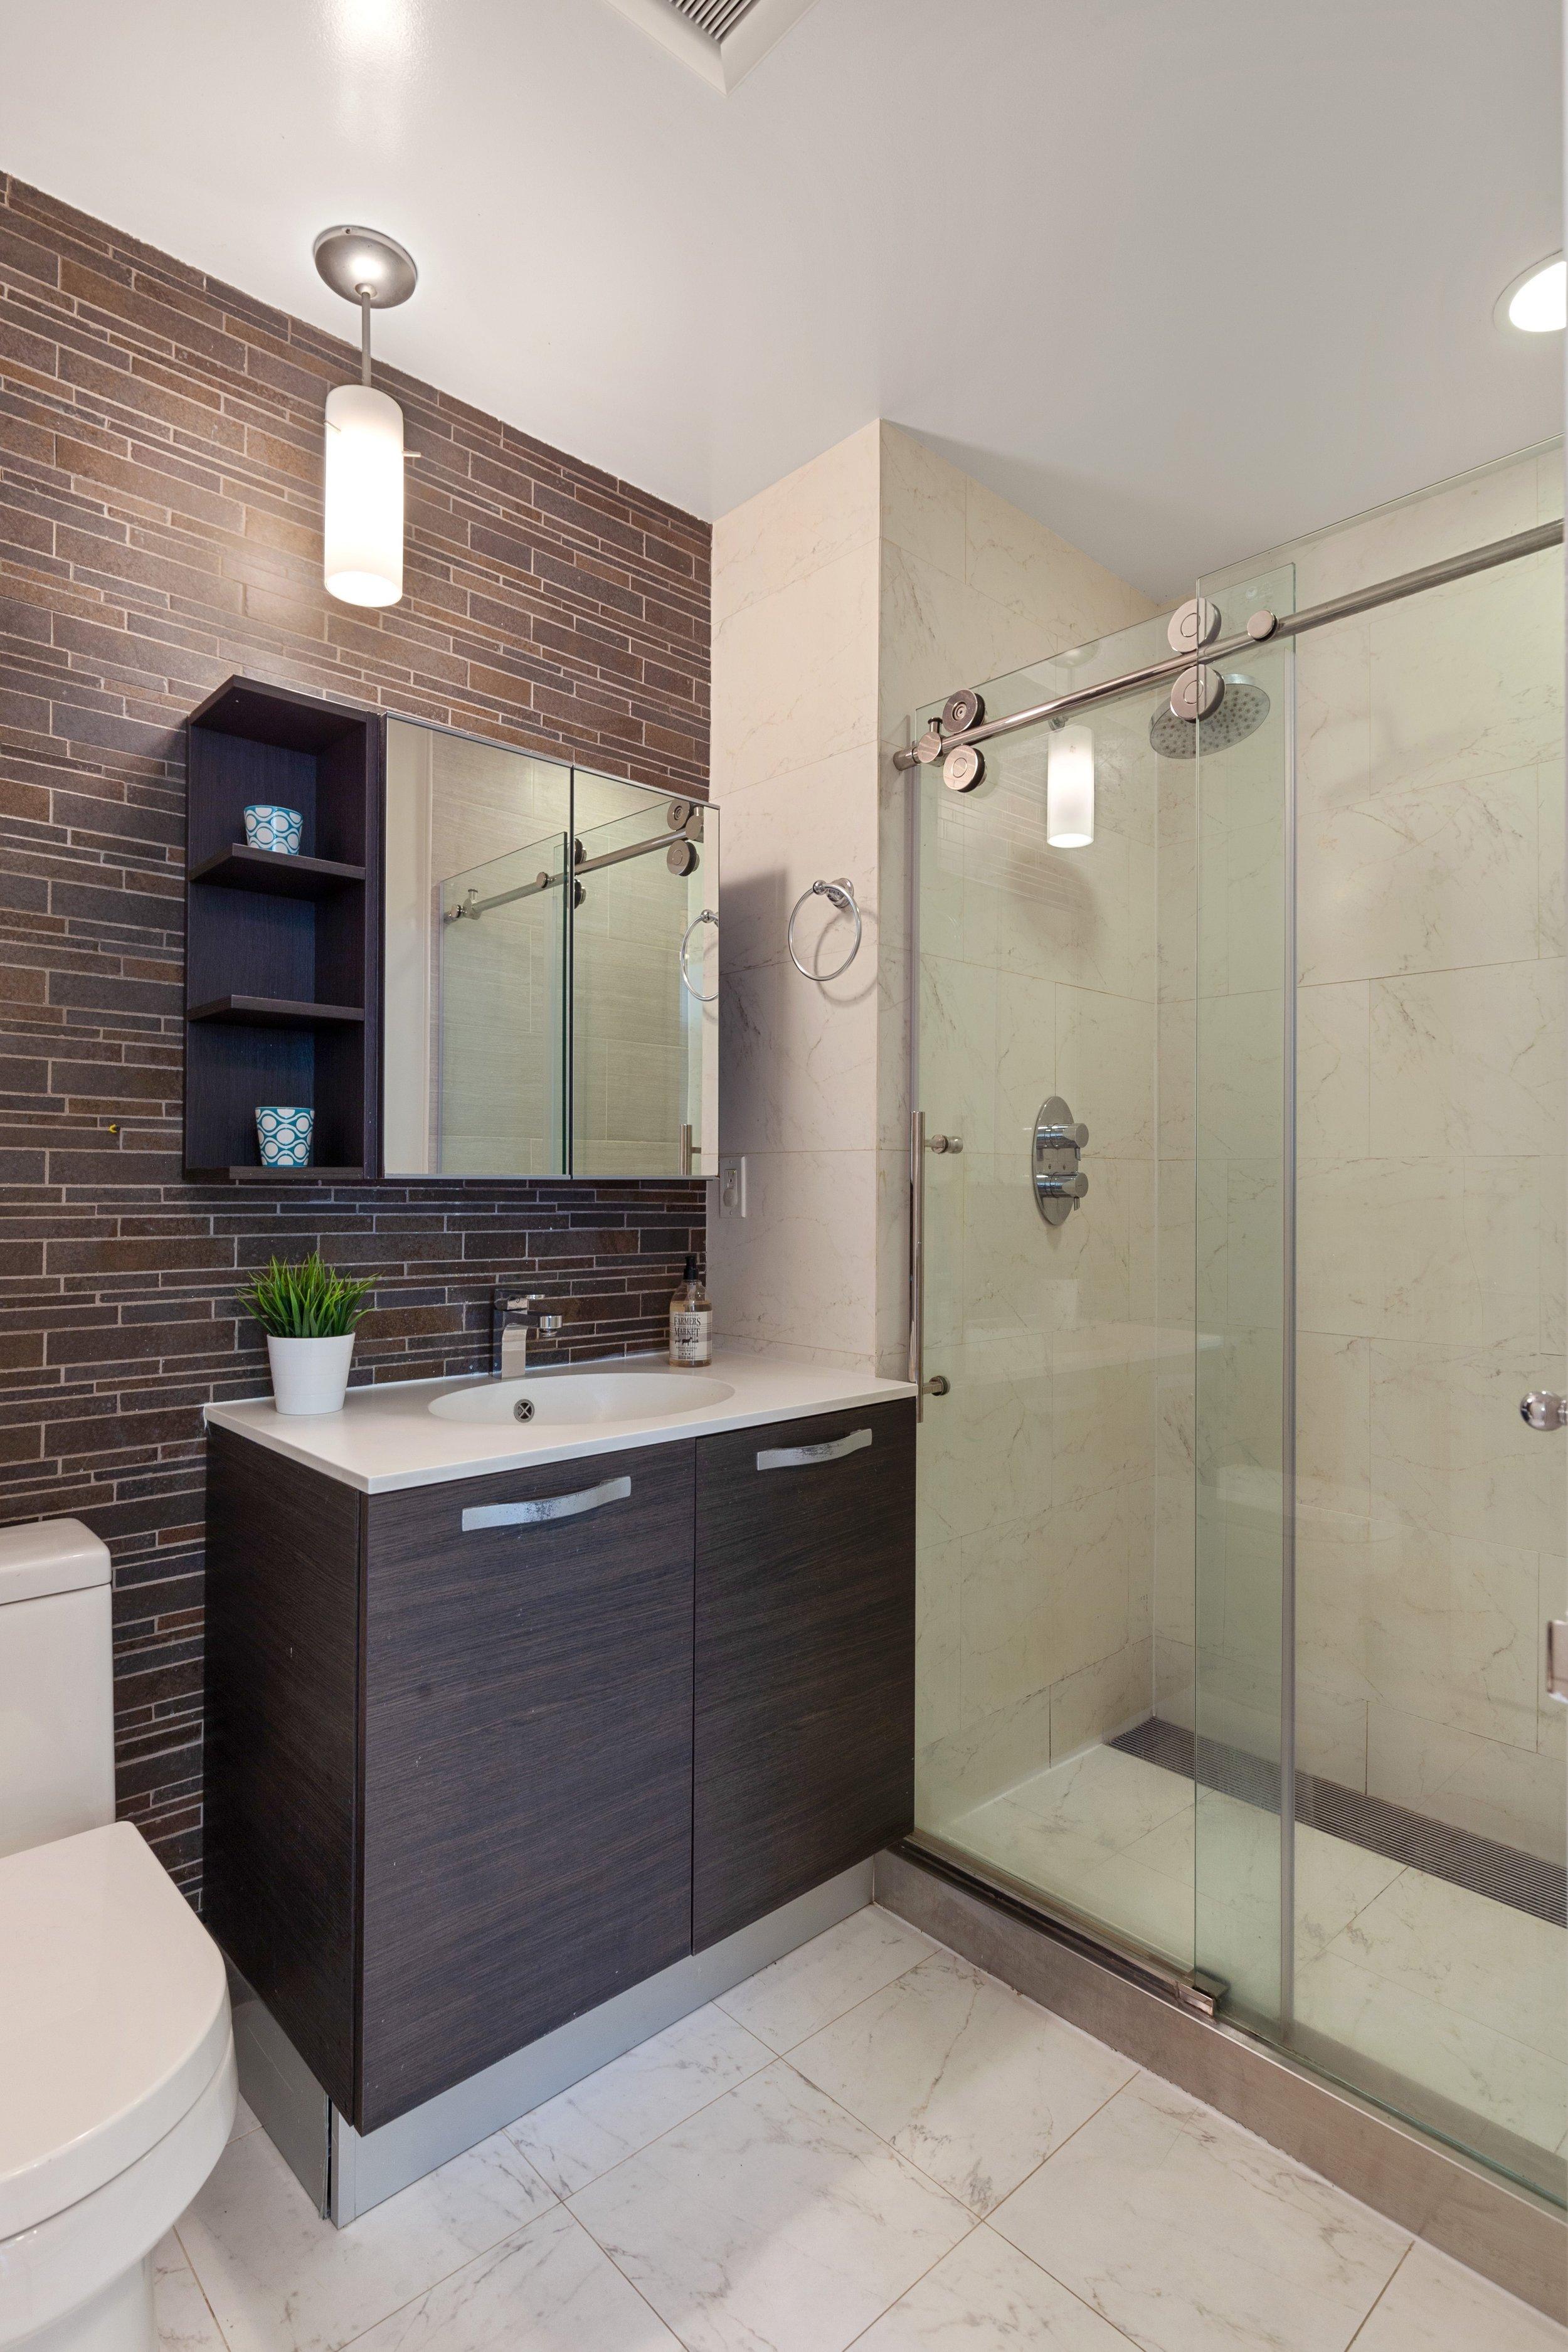 09_16388thAvenue_1A_8_Bathroom_HiRes.jpg